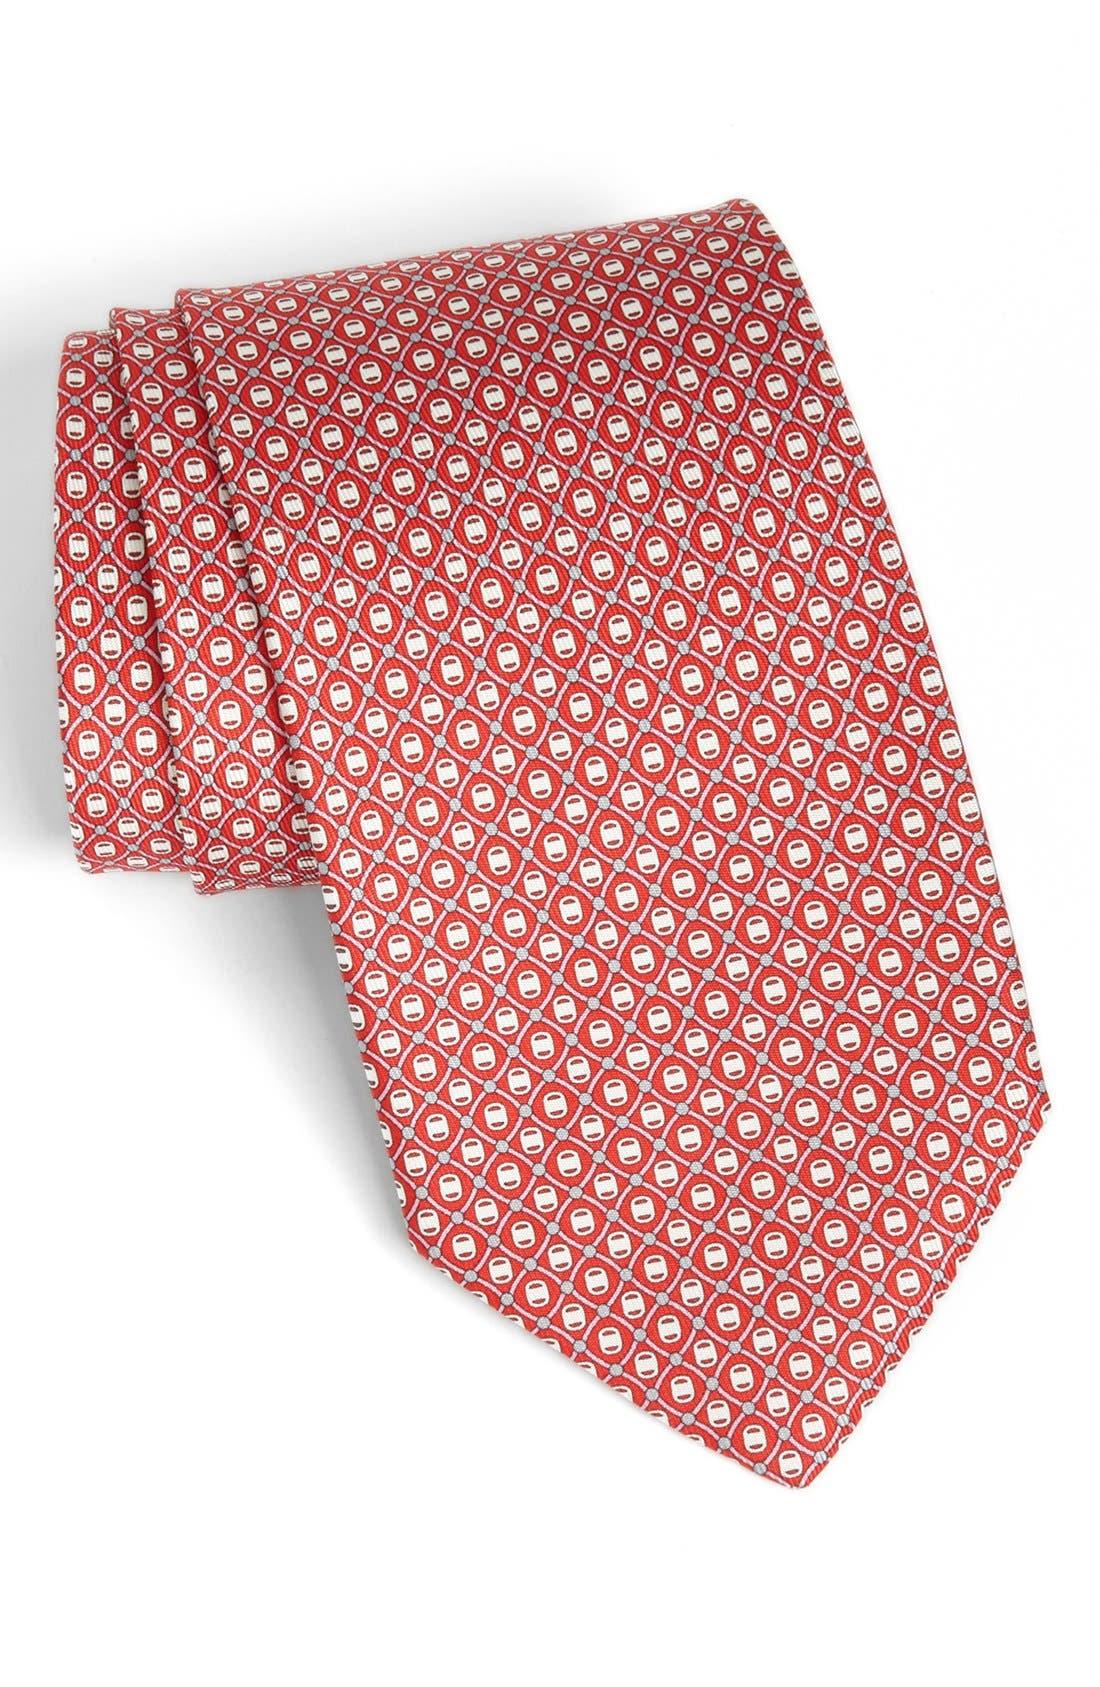 Main Image - Salvatore Ferragamo Grid Print Silk Tie